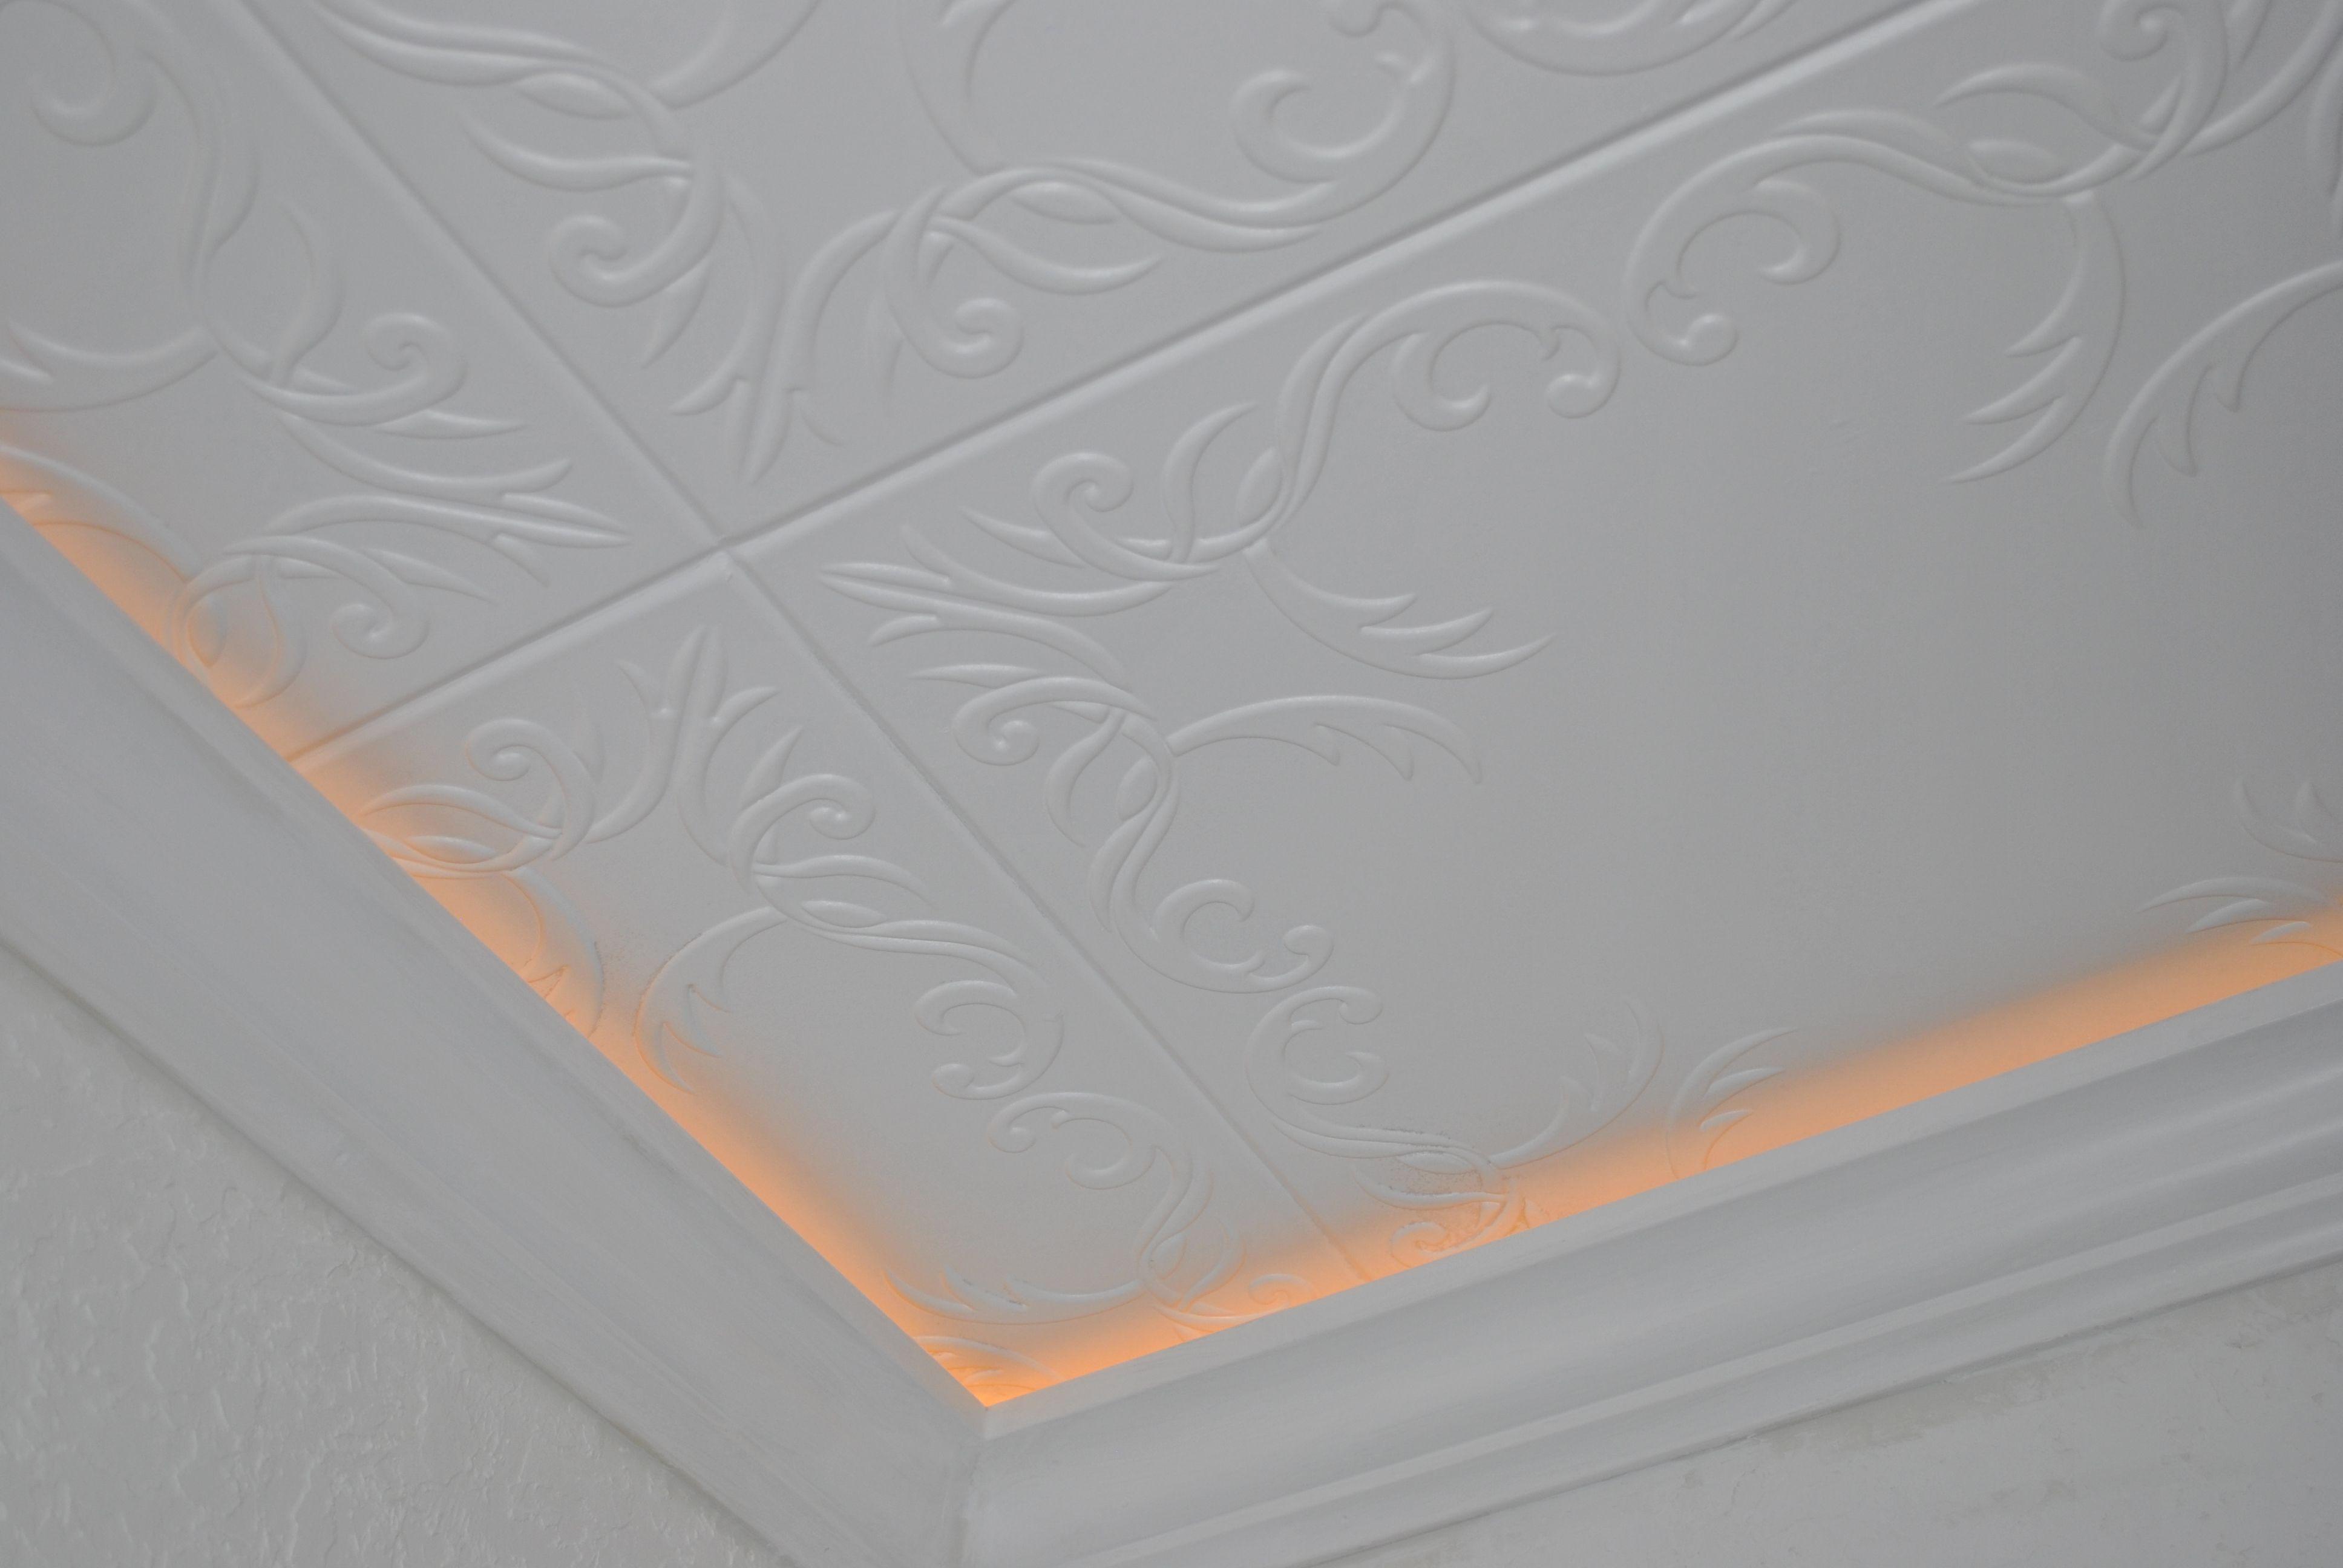 Antique white foam ceiling tiles